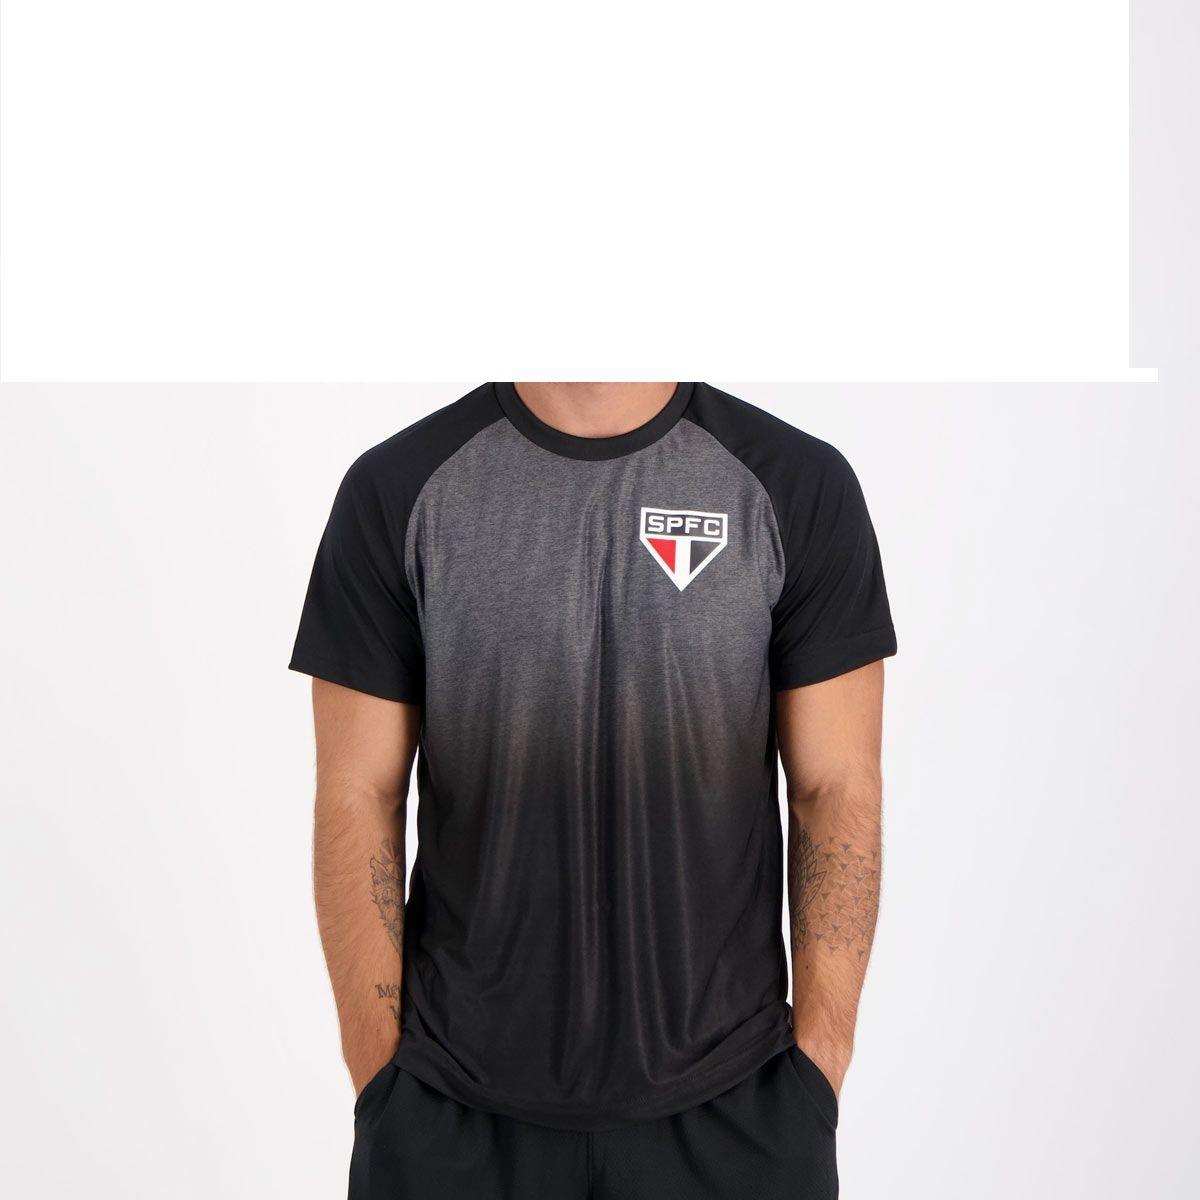 Camiseta SPR São Paulo F C Gino Masculino